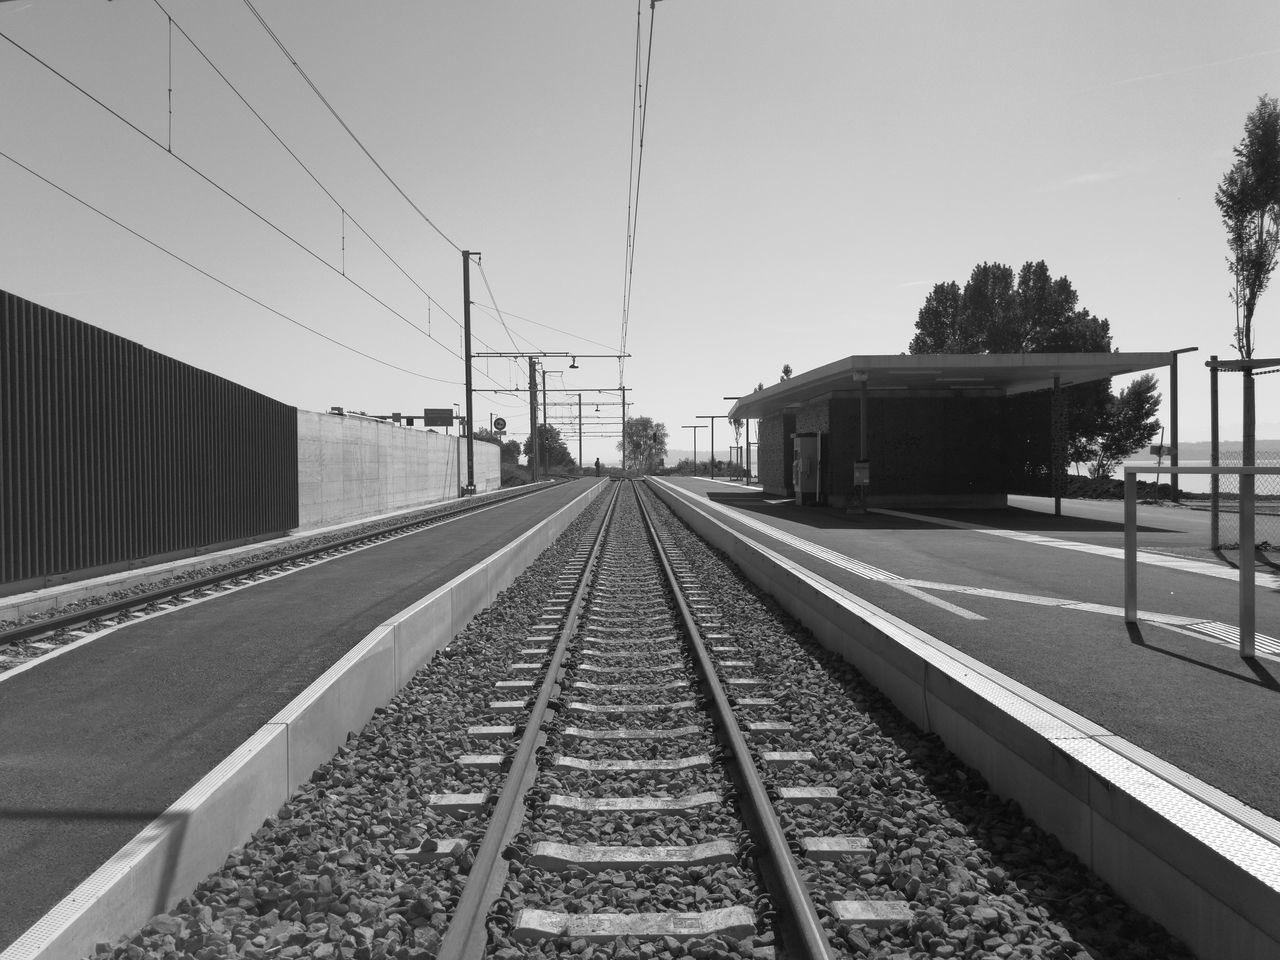 Perspective Lines Geometry Blackandwhite Blackandwhite Photography Bright Day Daylight Rails Tramway The Street Photographer - 2017 EyeEm Awards